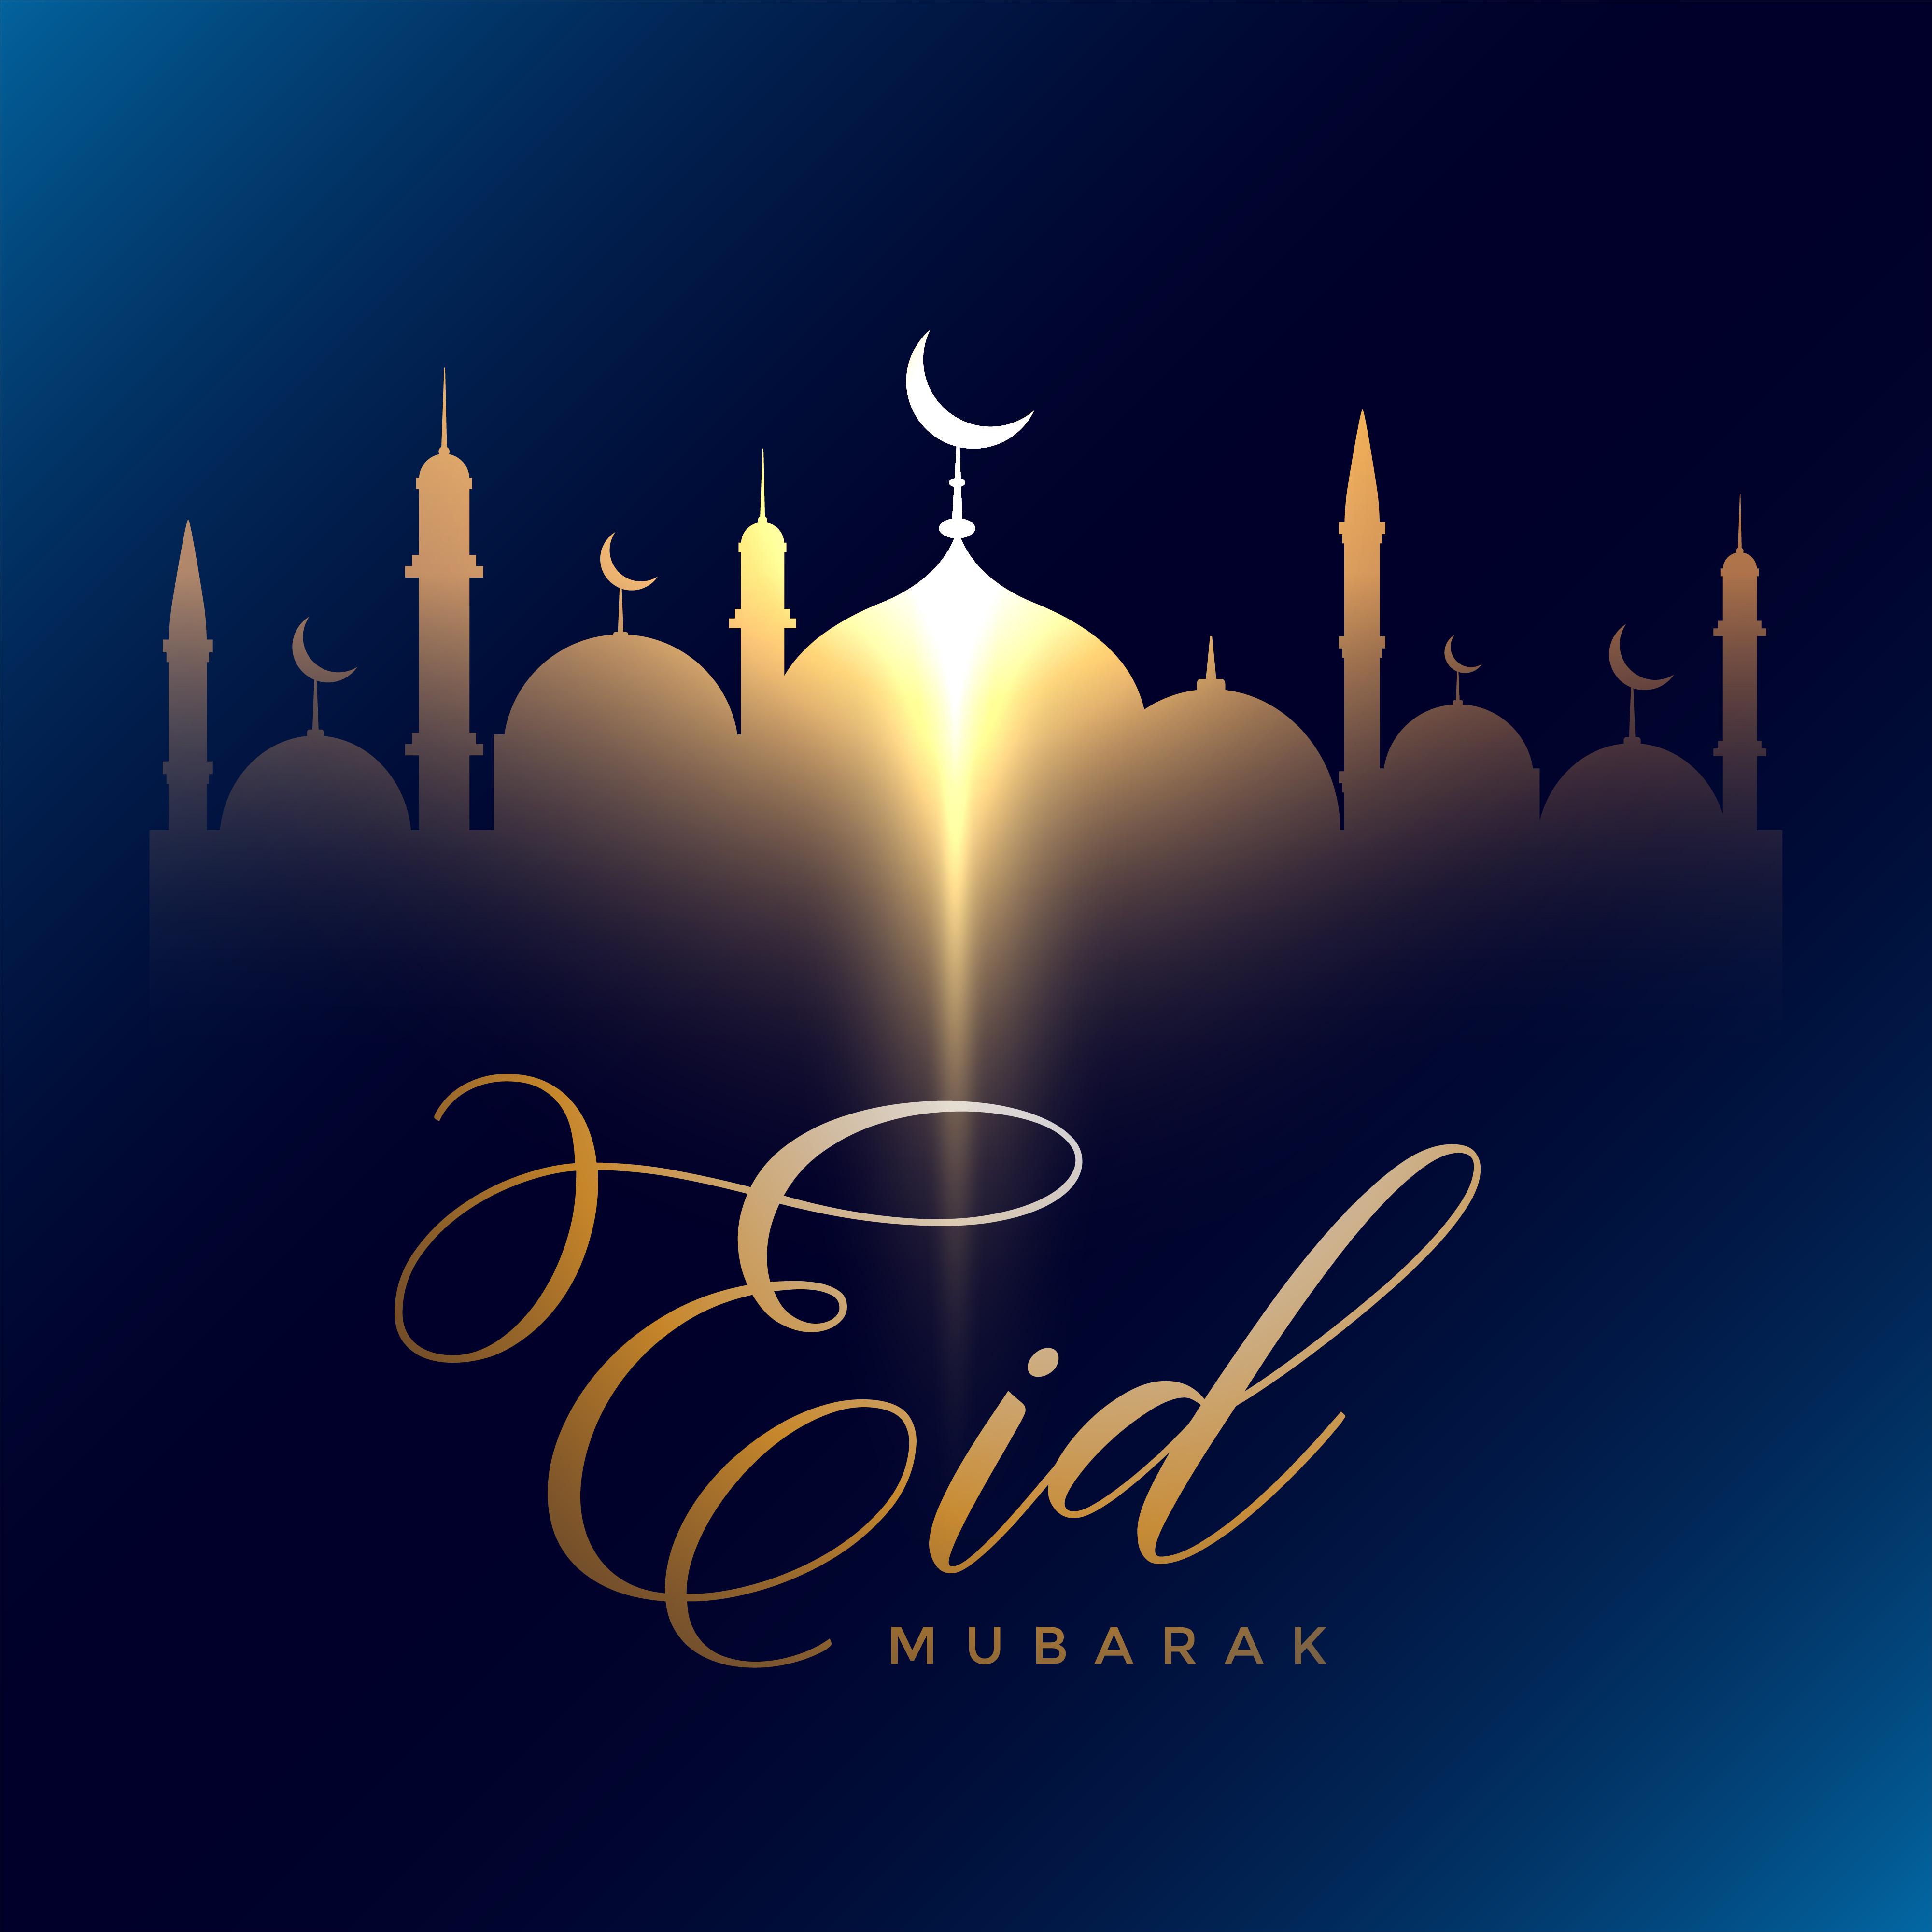 Eid Mubarak Greeting With Glowing Golden Mosque Shape Download